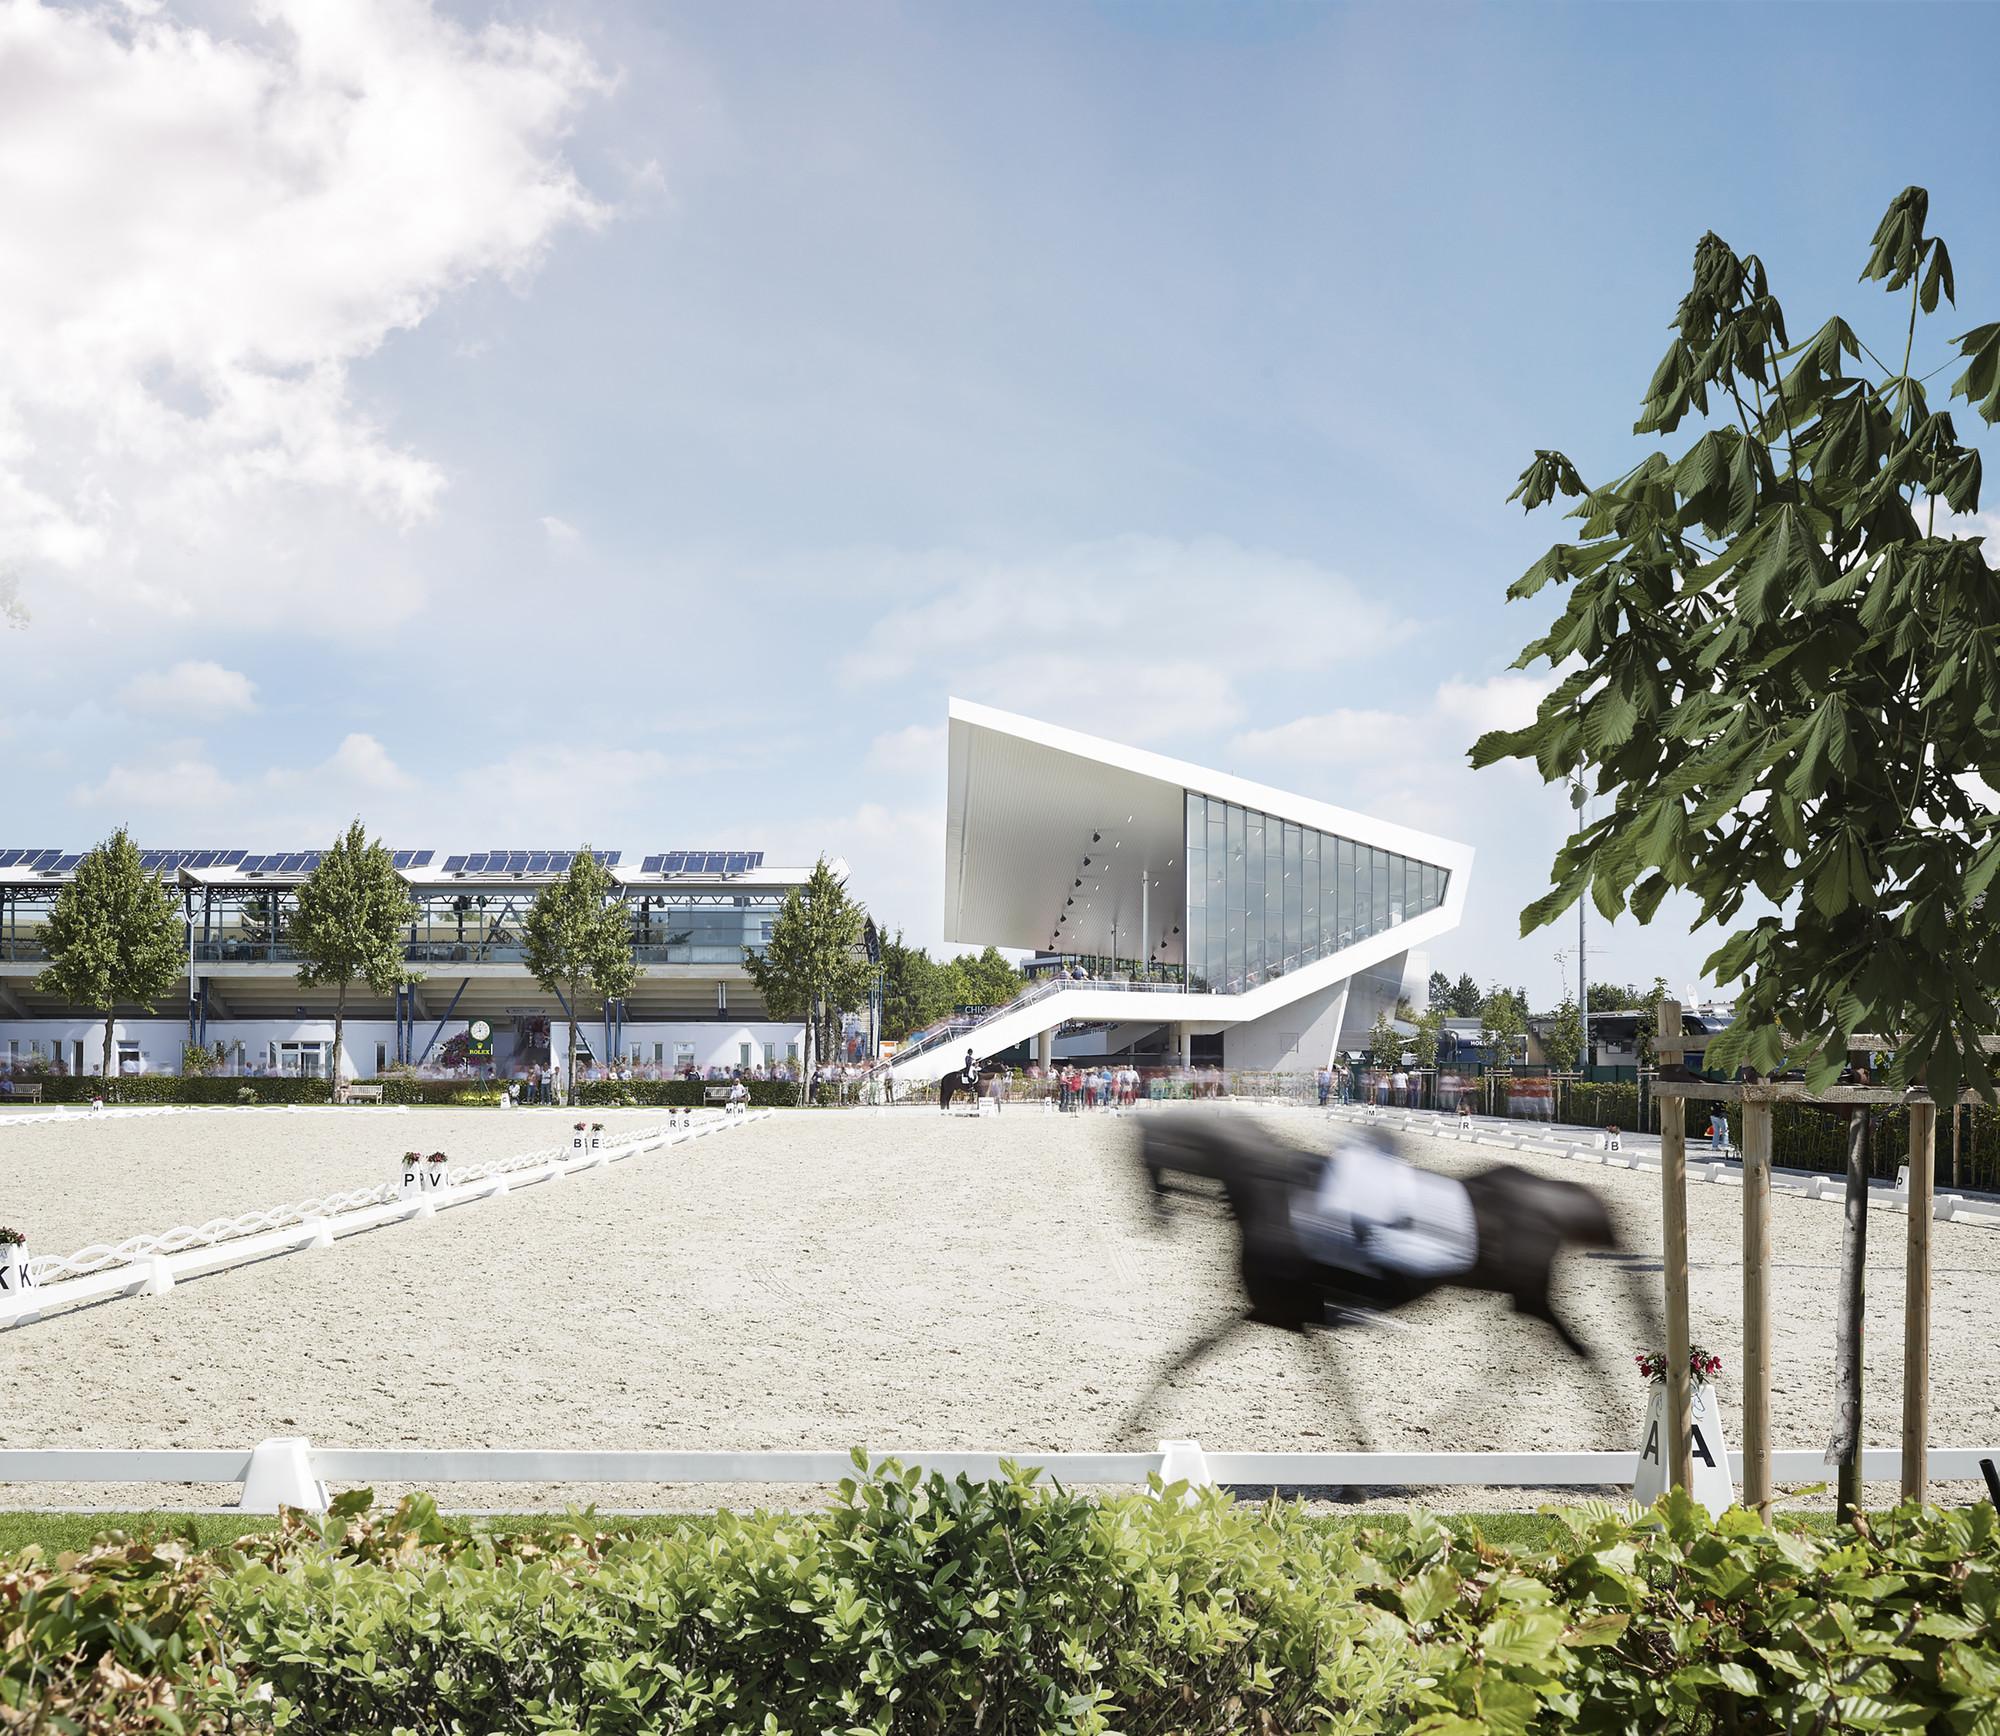 Dressage Arena Extension / Kadawittfeldarchitektur, © Andreas Horsky